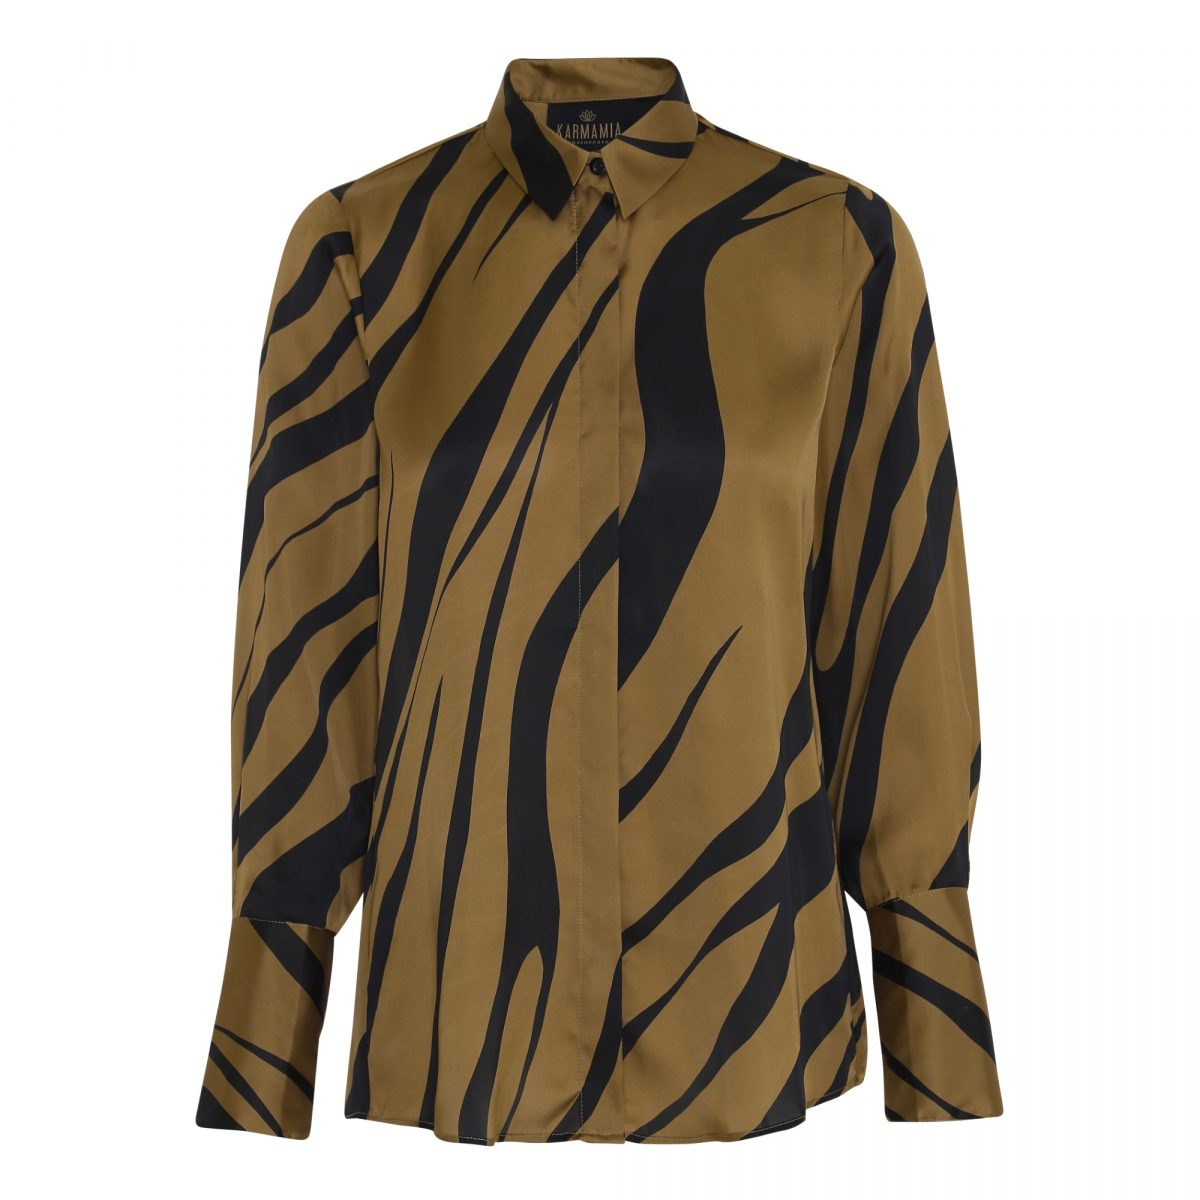 Zoe-Shirt-Gold-Tiger KARMAMIA IMAGE BY ME